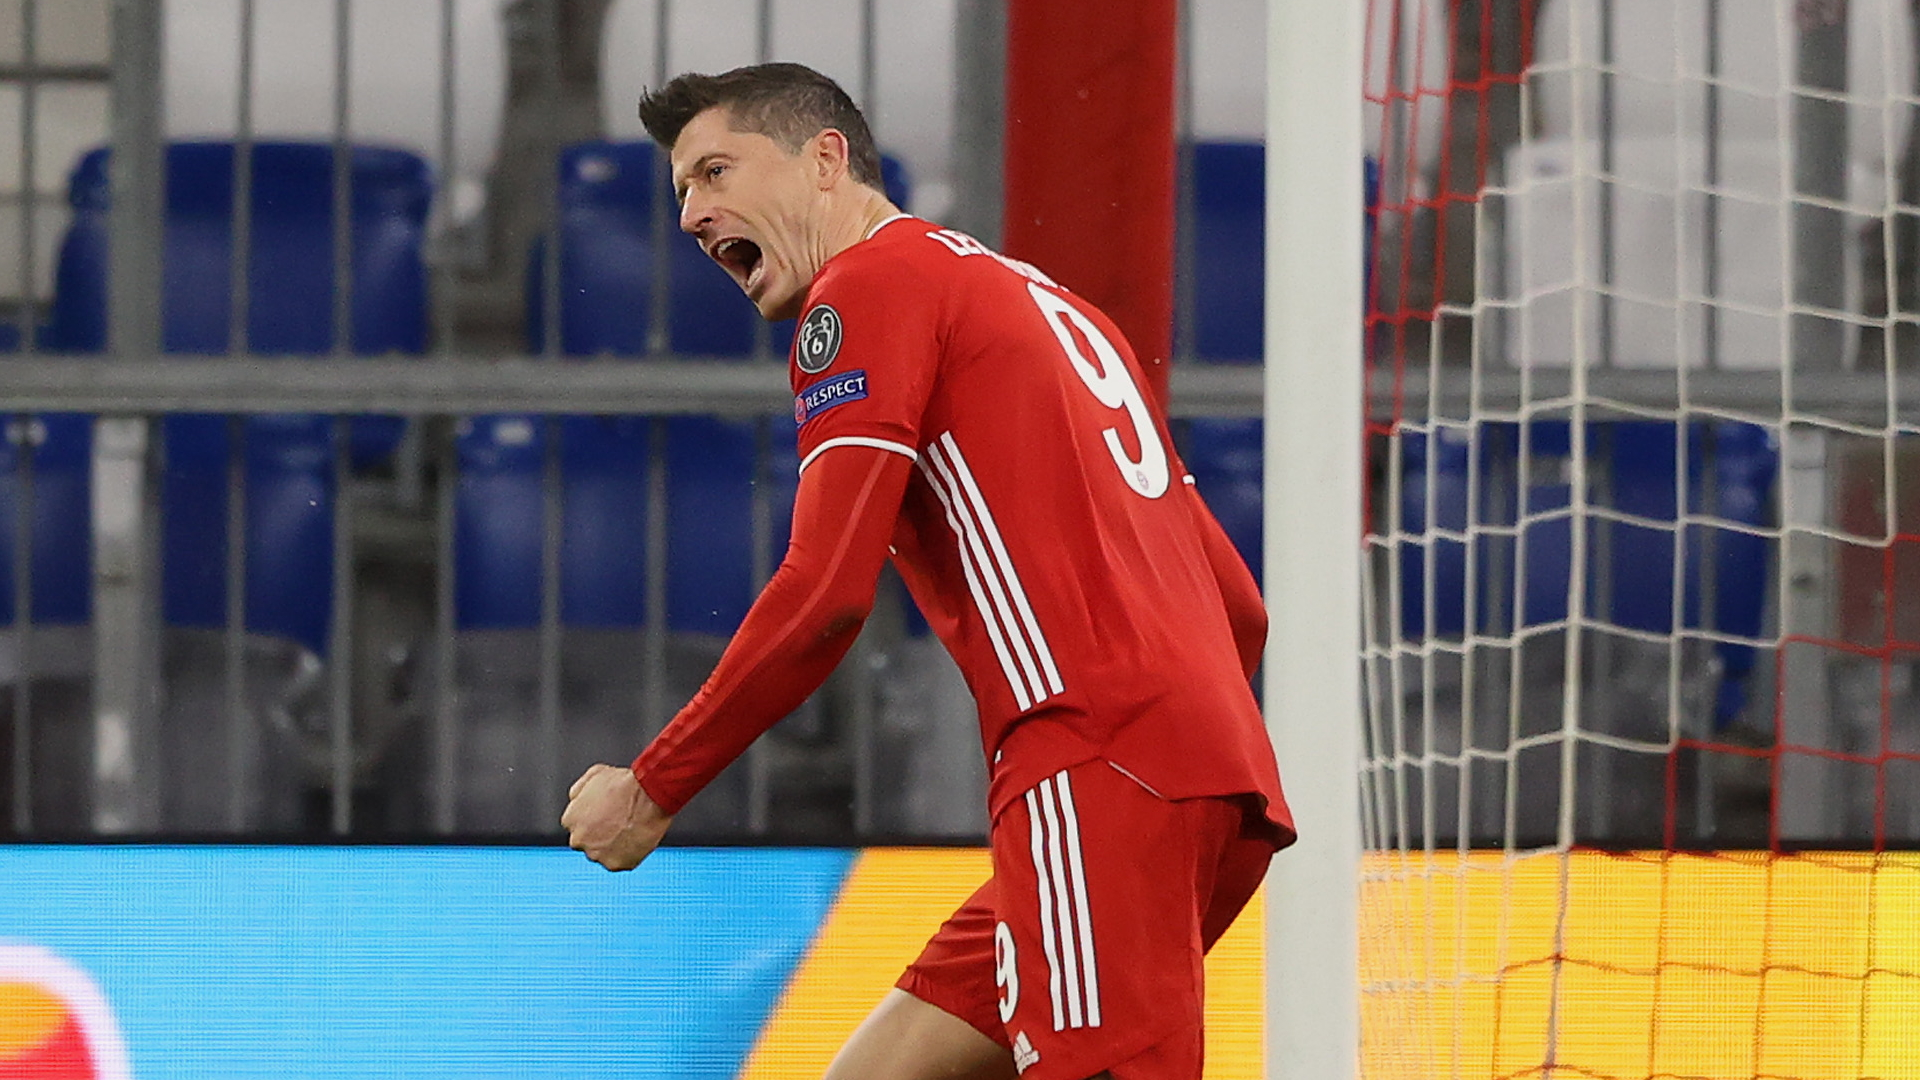 Bayern Monaco-Lazio 2-1: bavaresi troppo forti, biancocelesti eliminati